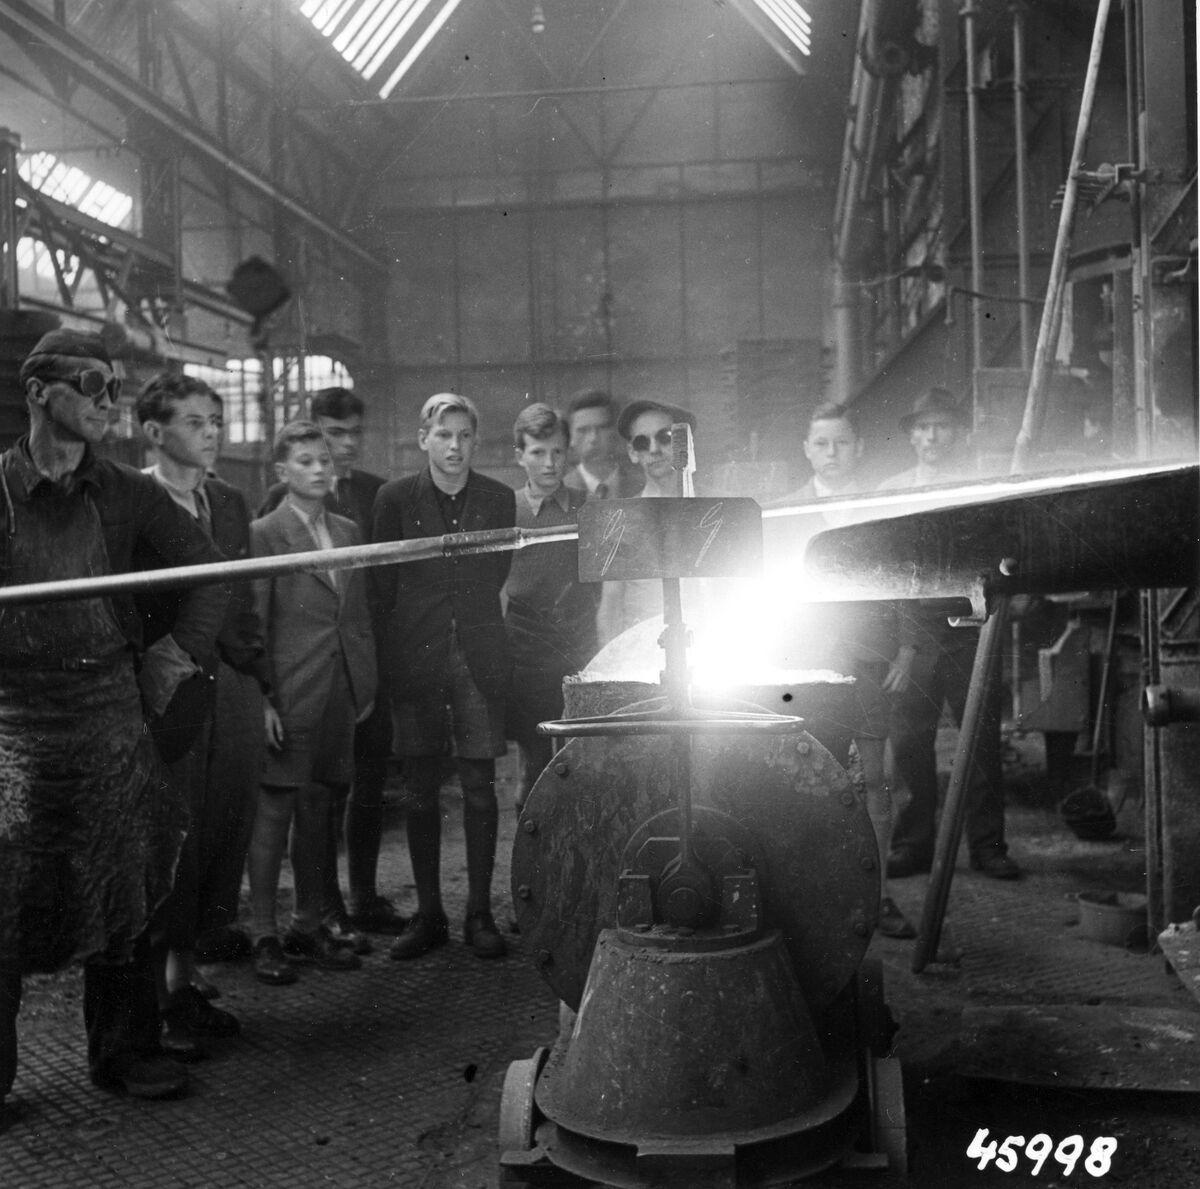 GFA 12/45998: Reportage casting process in malleable casting